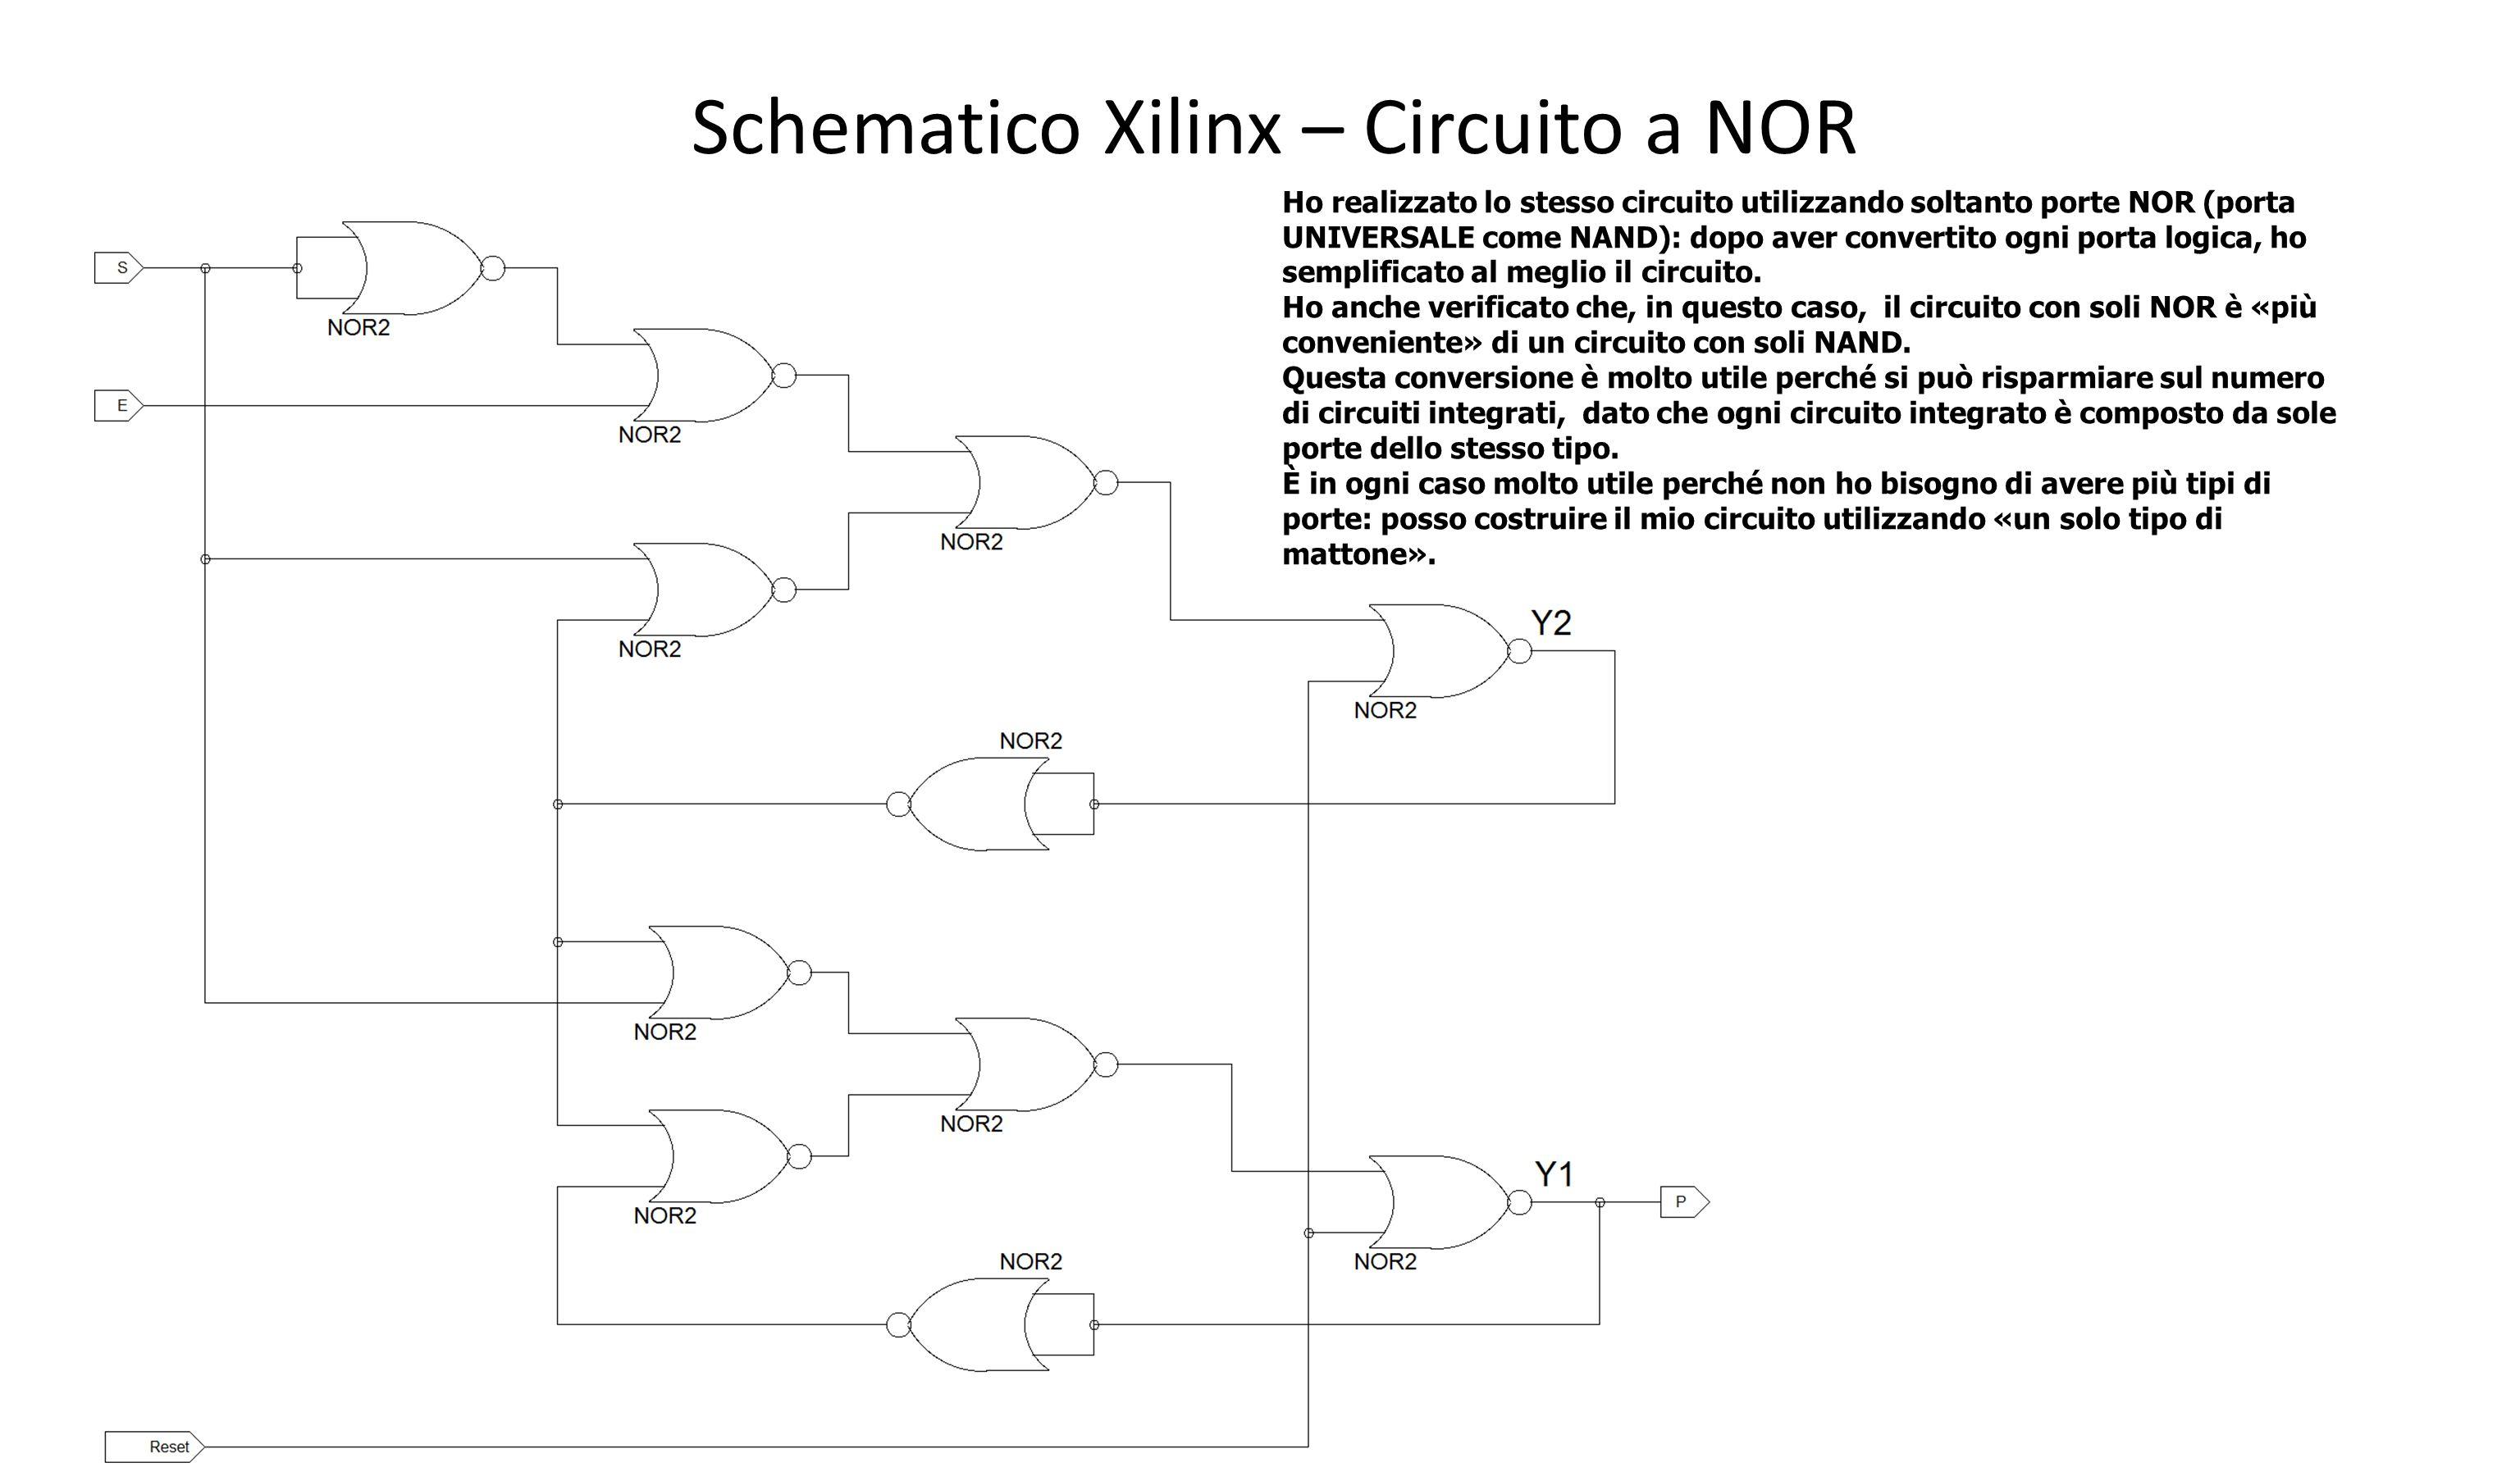 Schematico Xilinx – Circuito a NOR